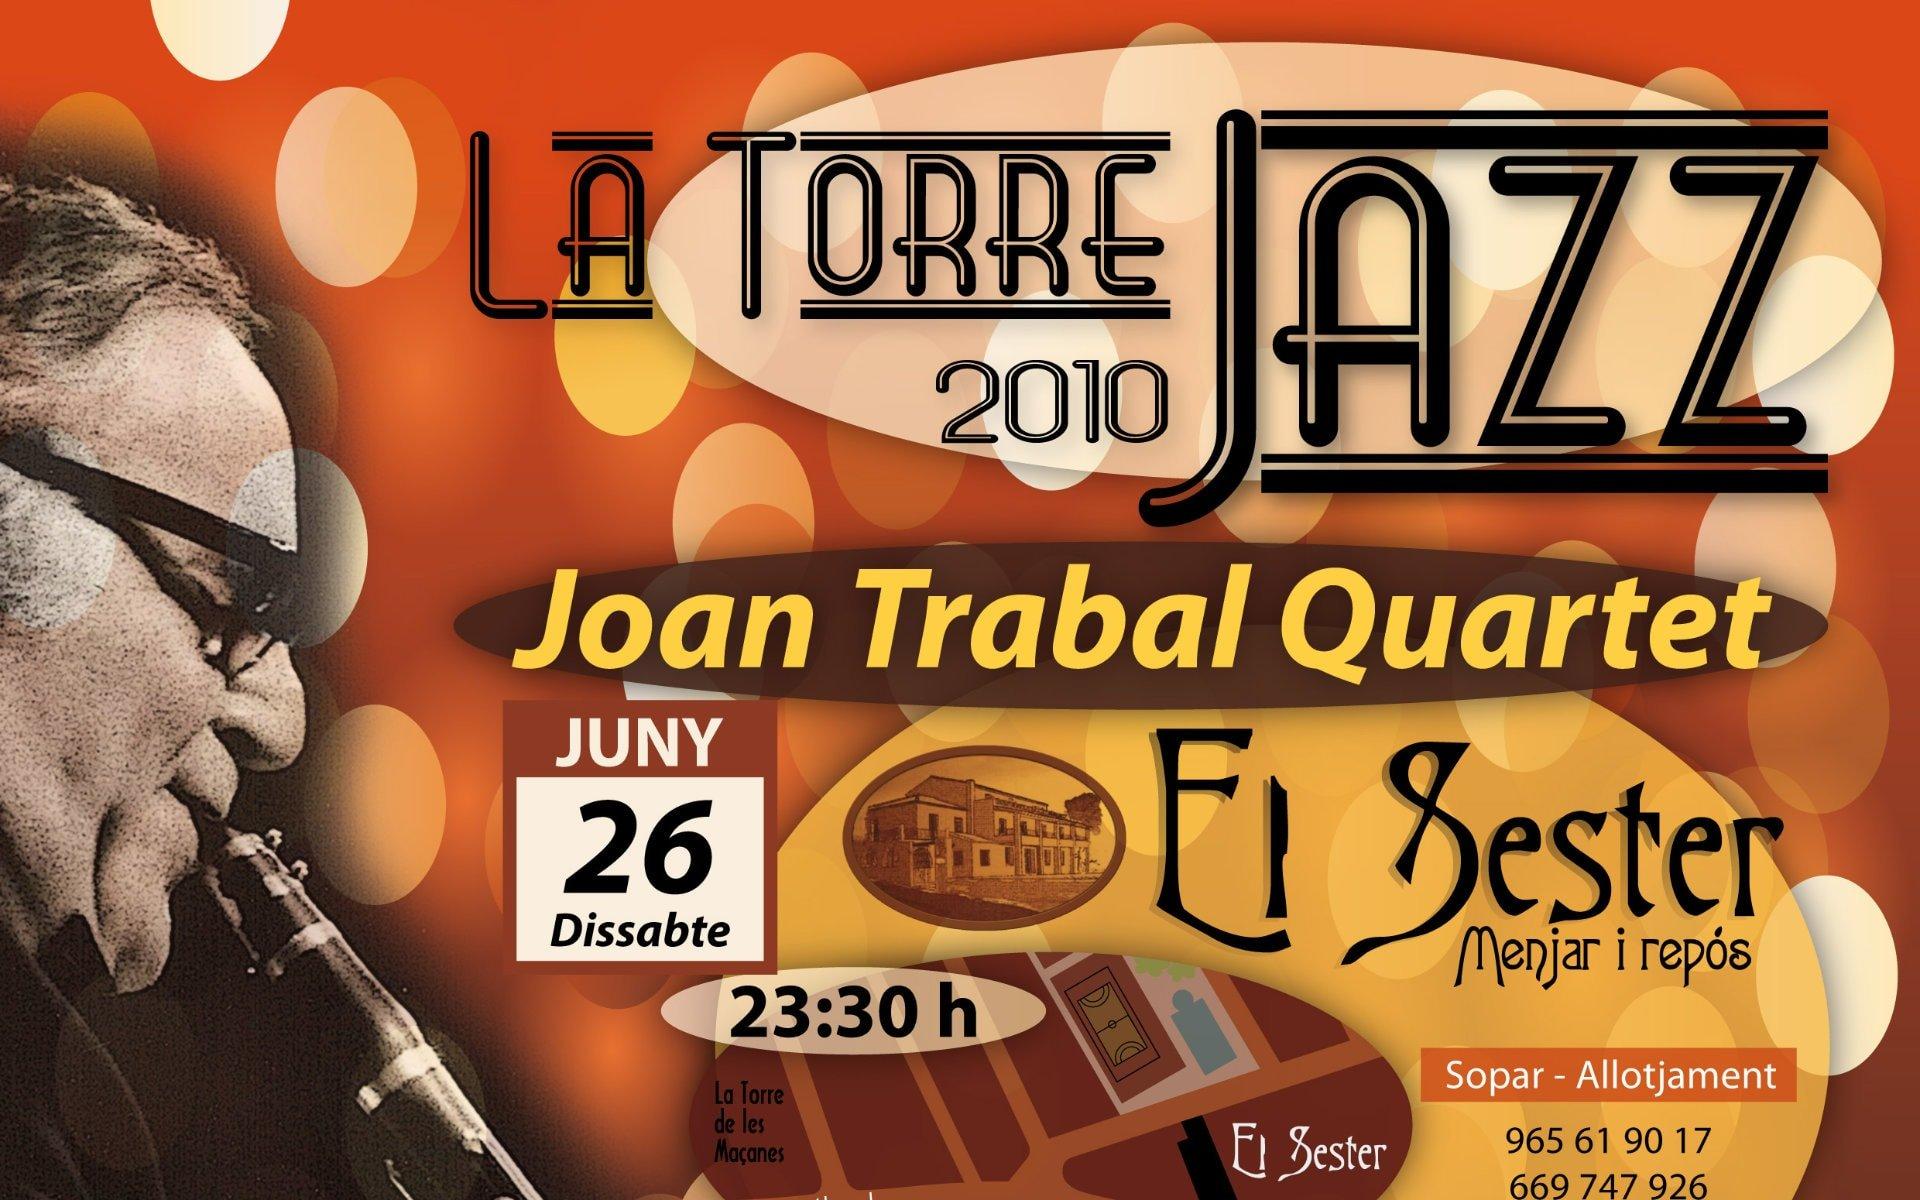 La Torre Jazz 2010